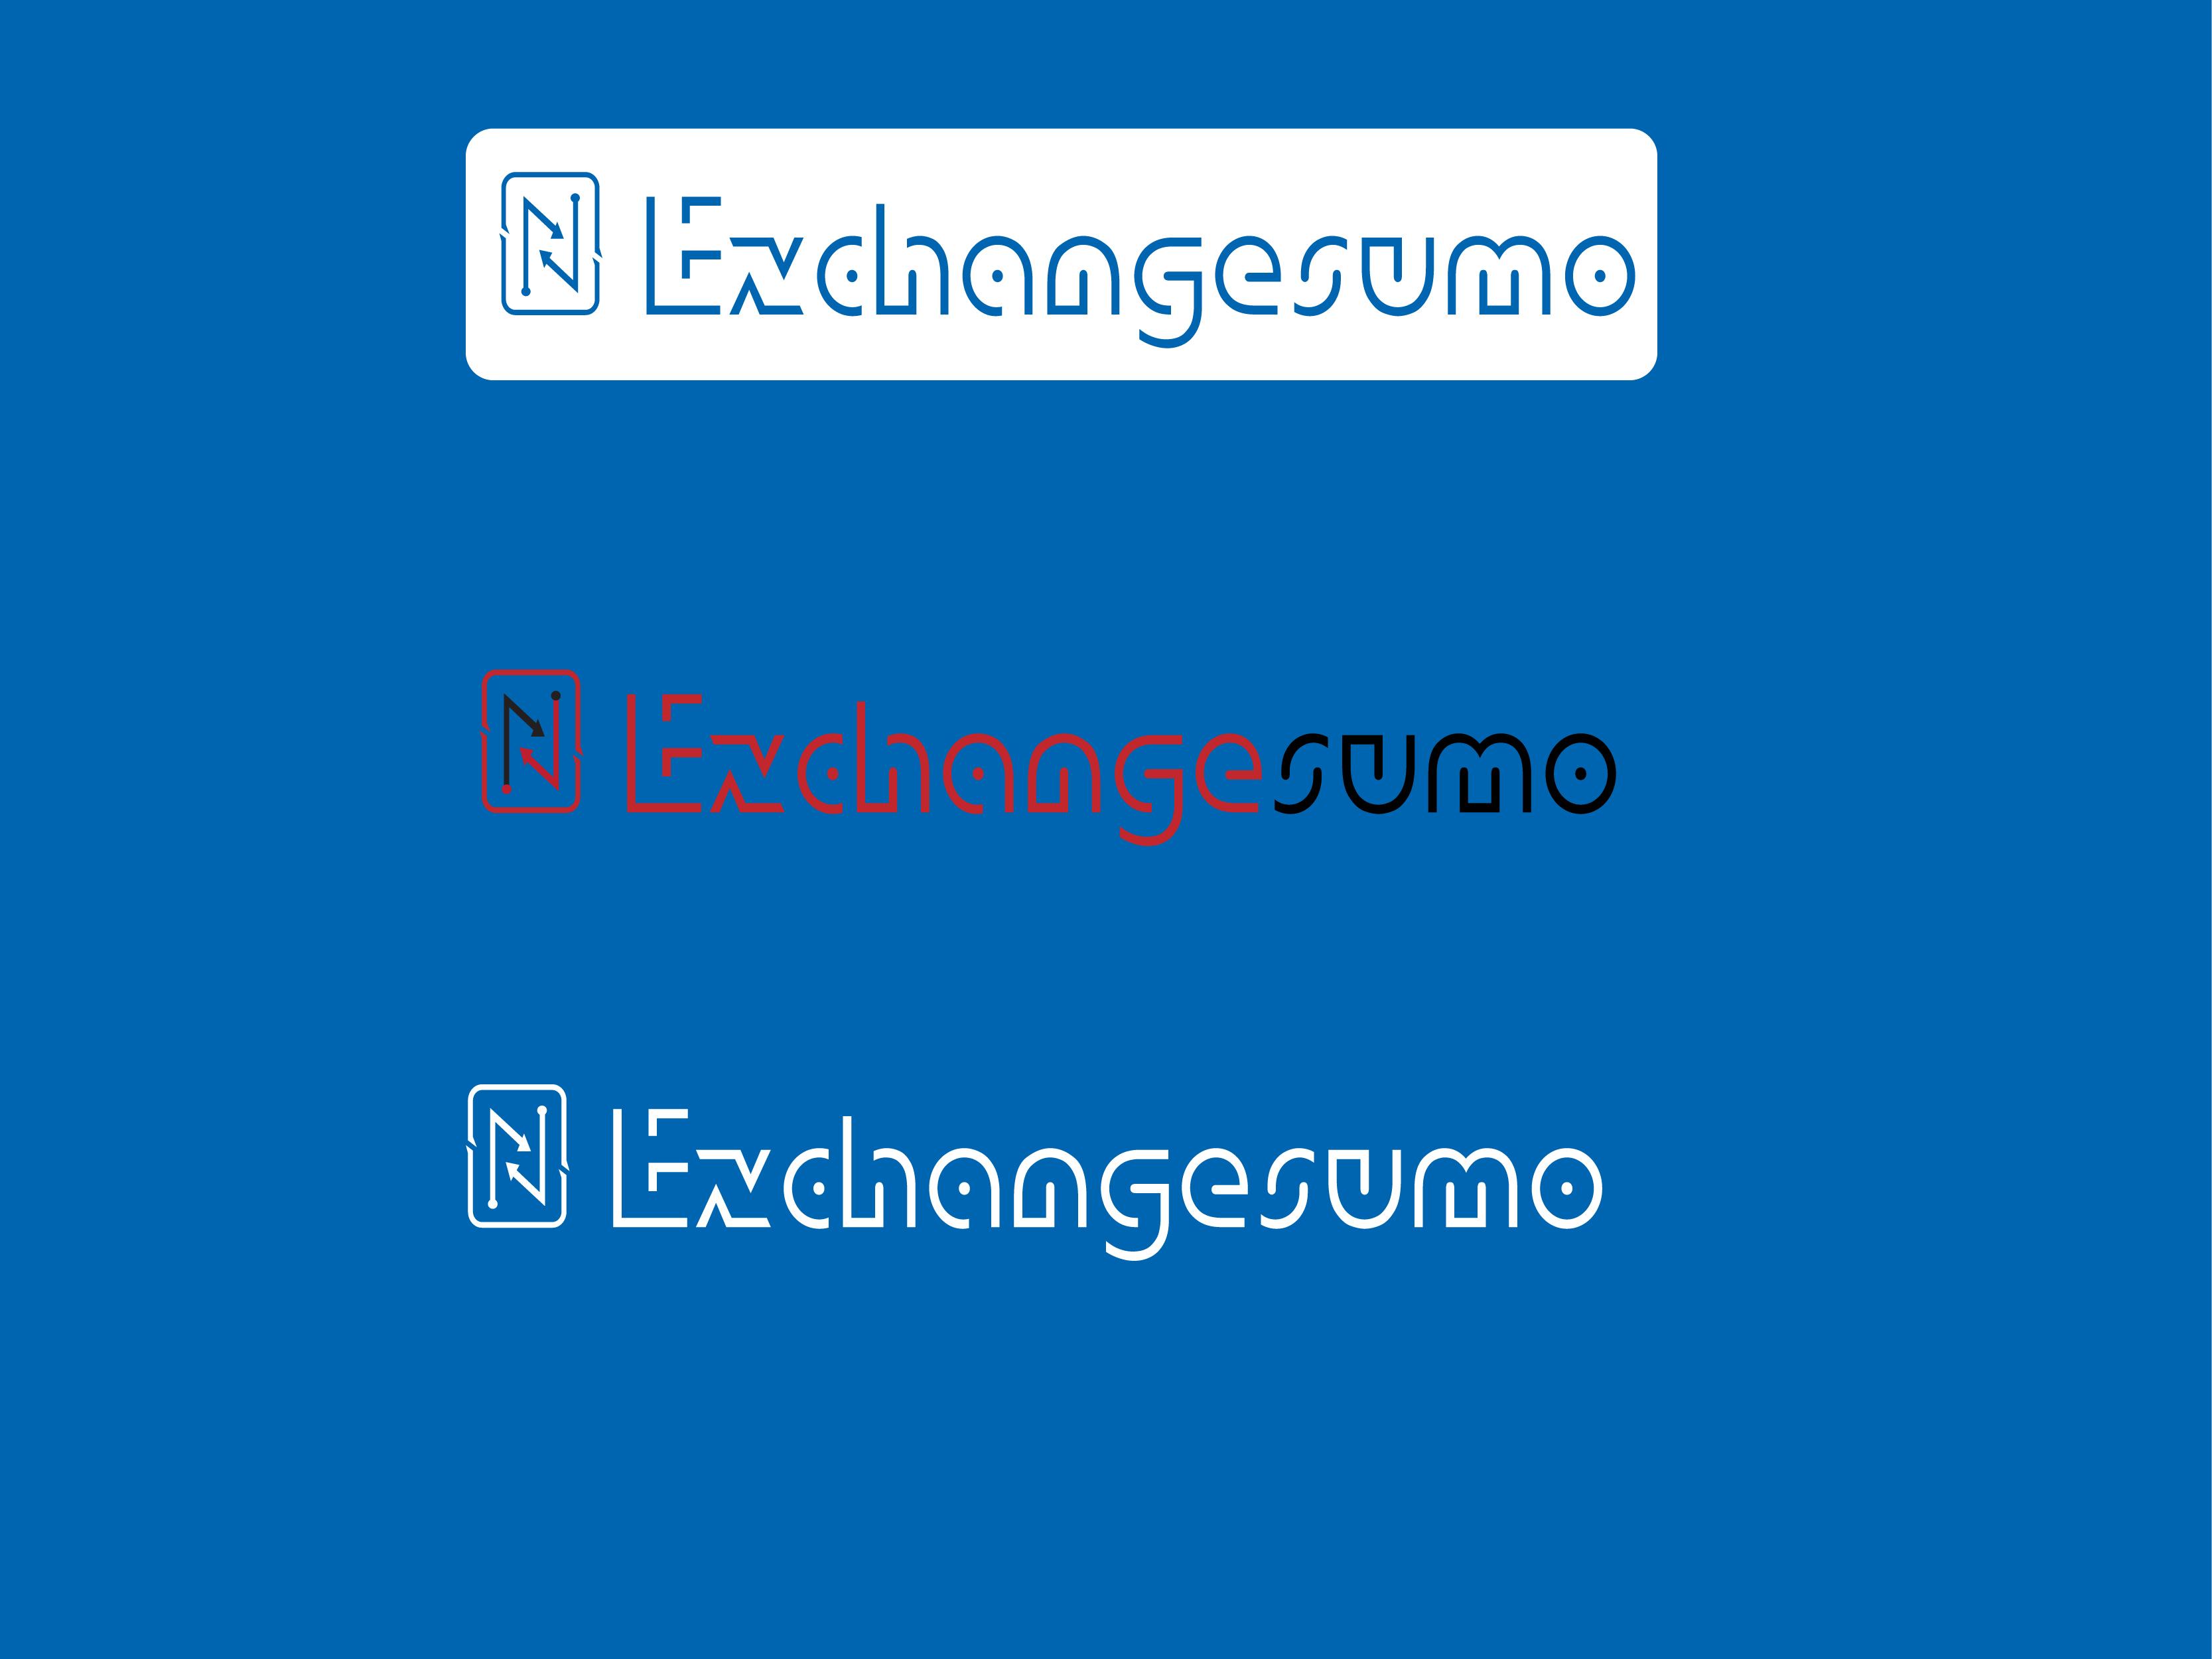 Логотип для мониторинга обменников фото f_1665bb260d57c4d3.jpg